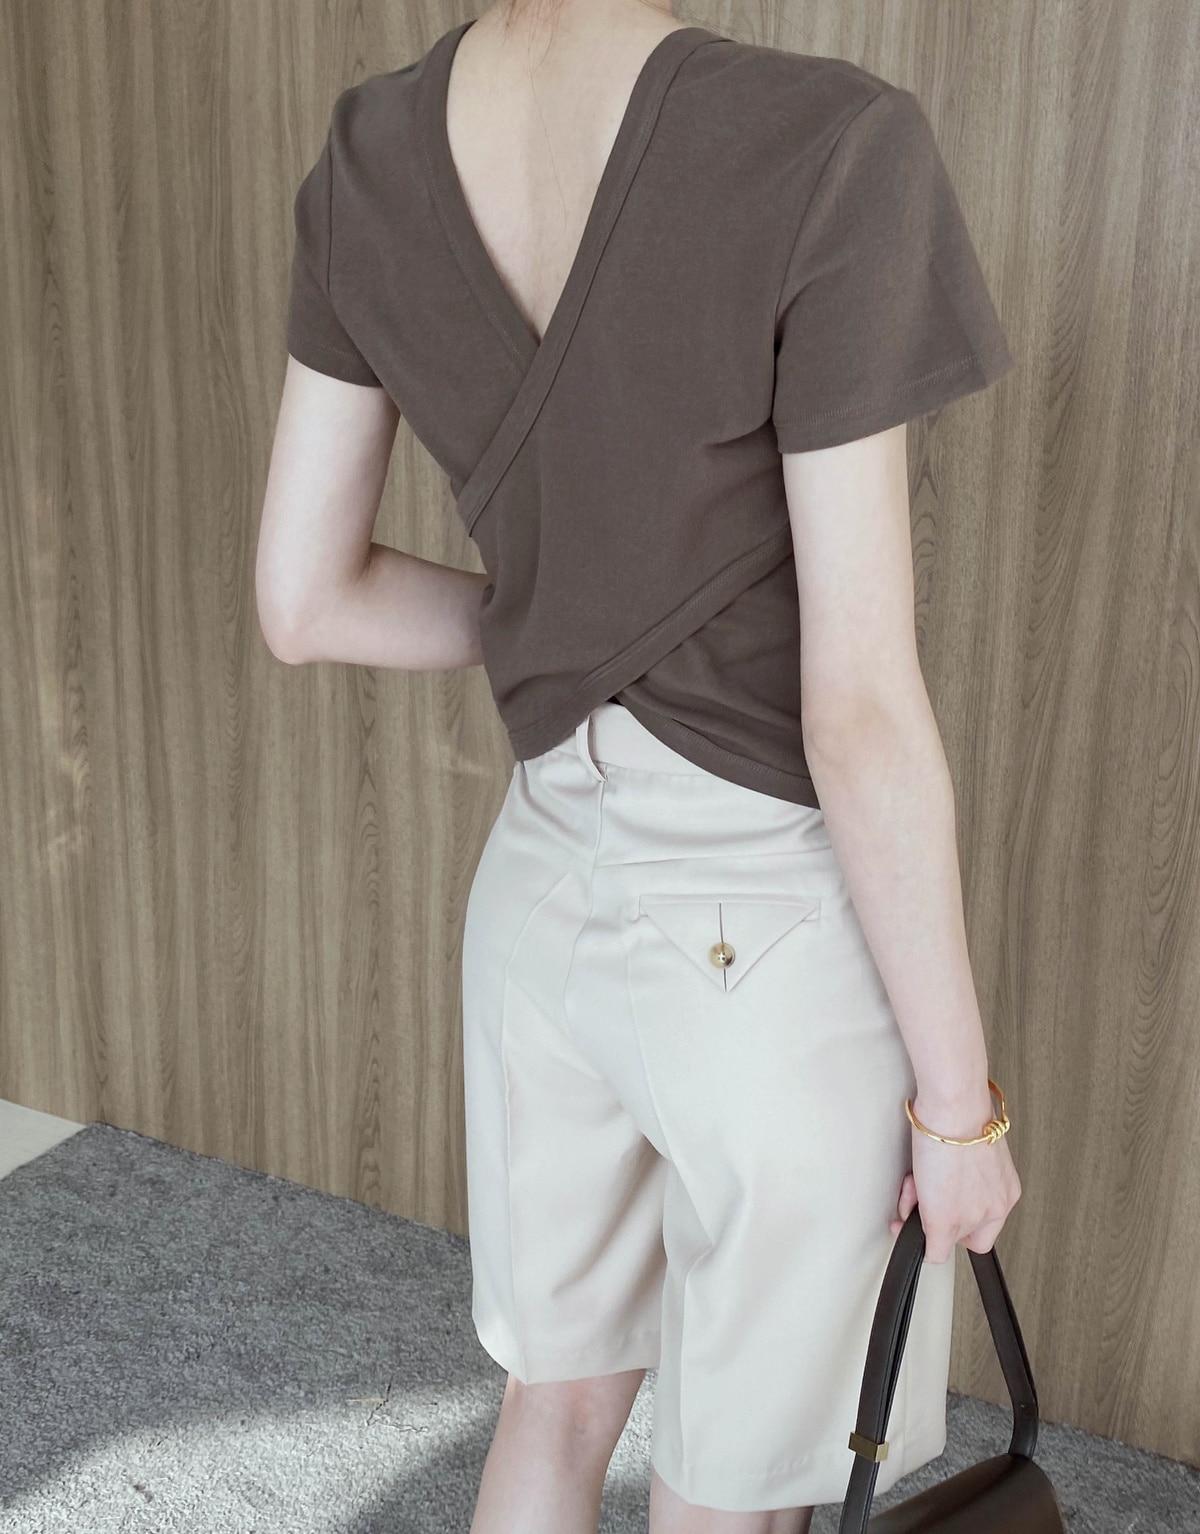 Cross Beauty Back Two-Way Short-Sleeved T-shirt Female 2021 Design Sense Hong Kong Style Simple All-